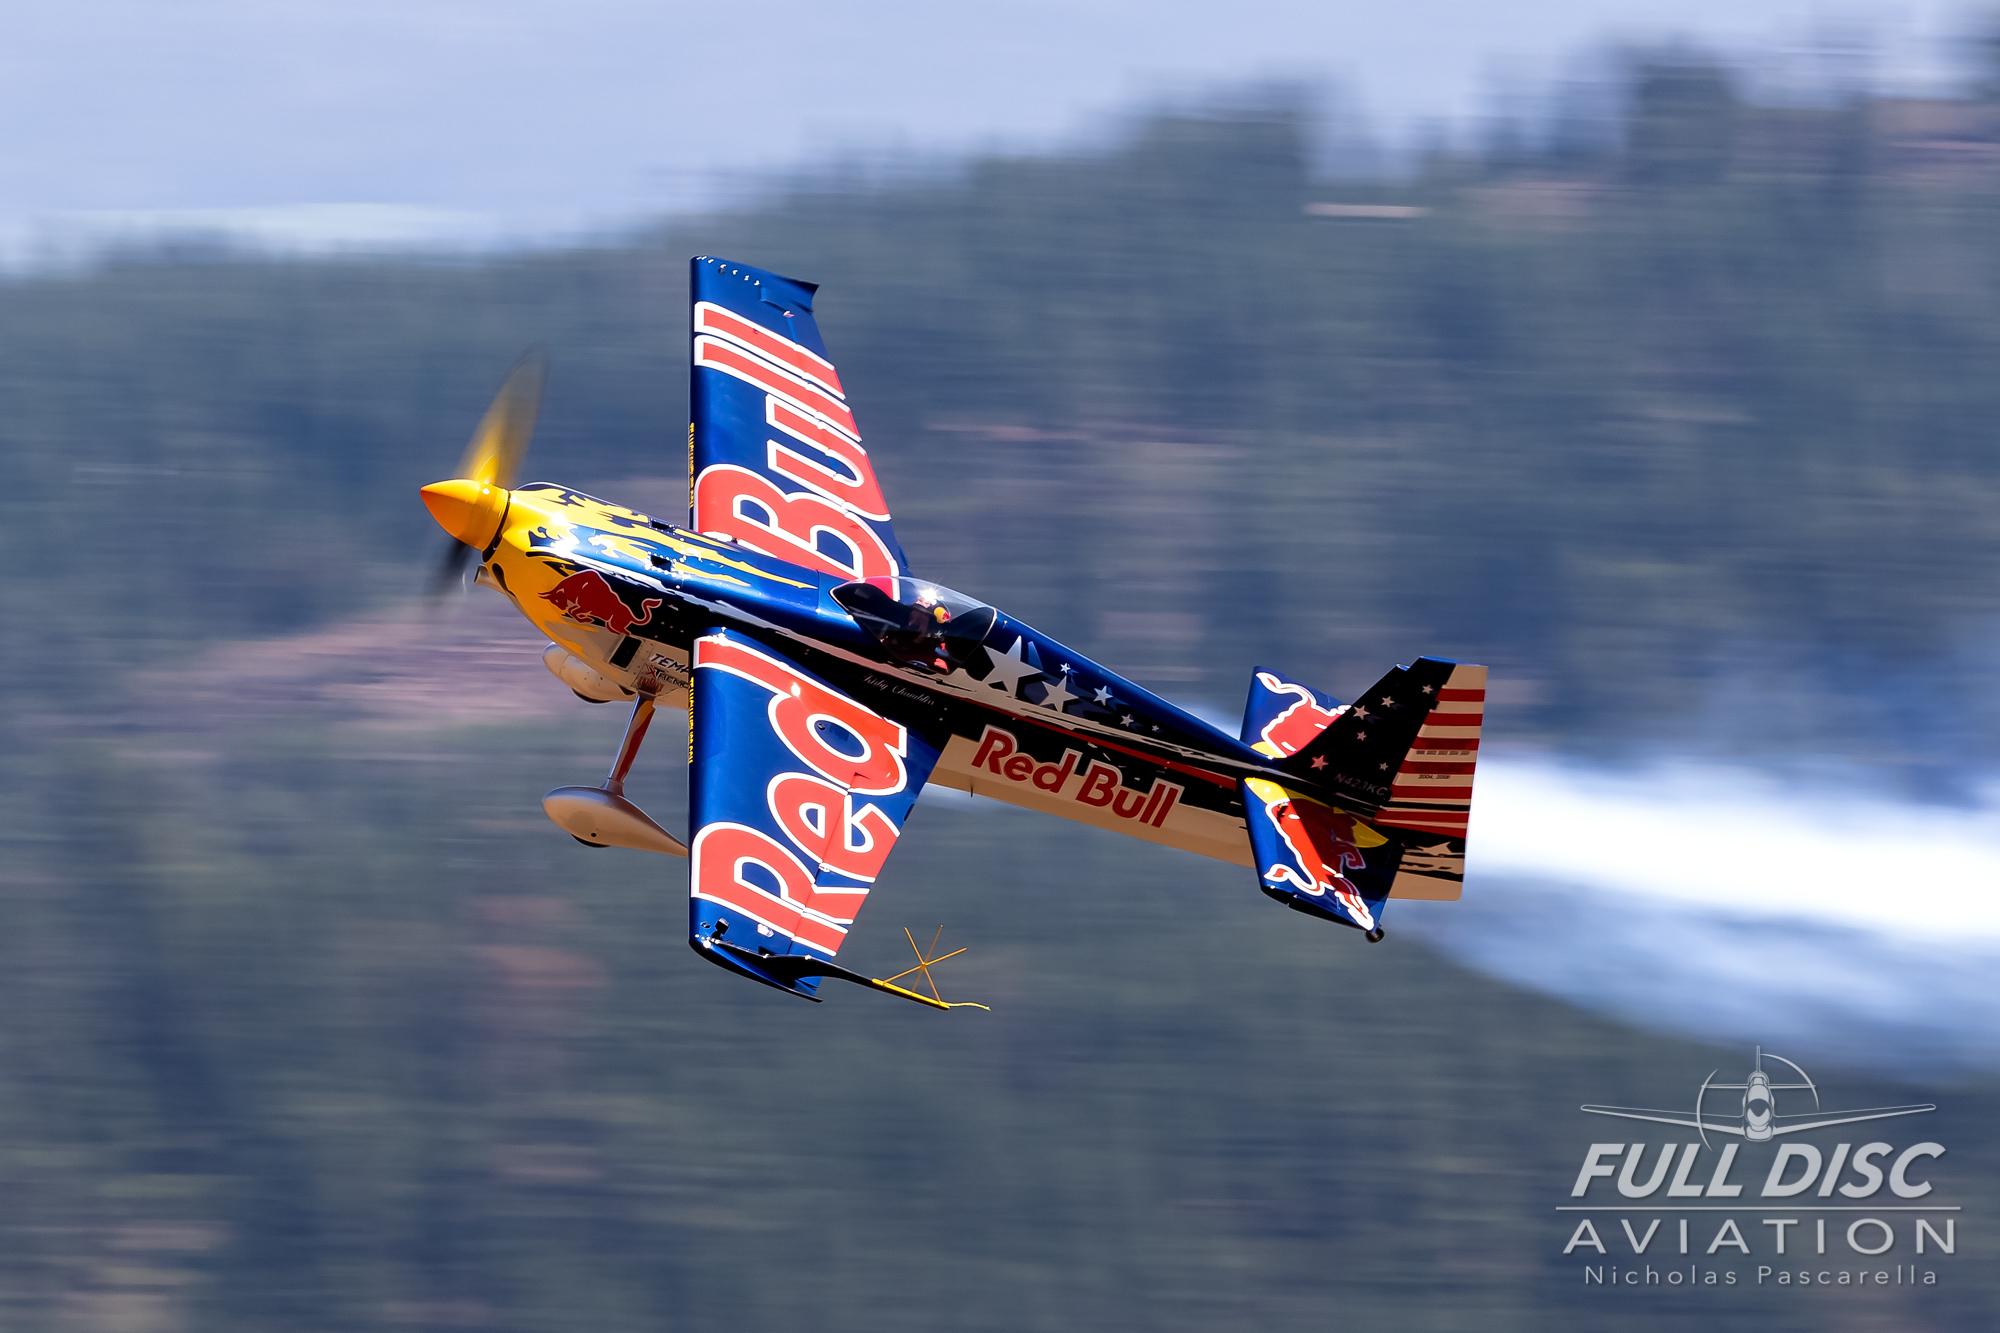 nickpascarella_nicholaspascarella_fulldiscaviation_aircraft_redbull.jpg